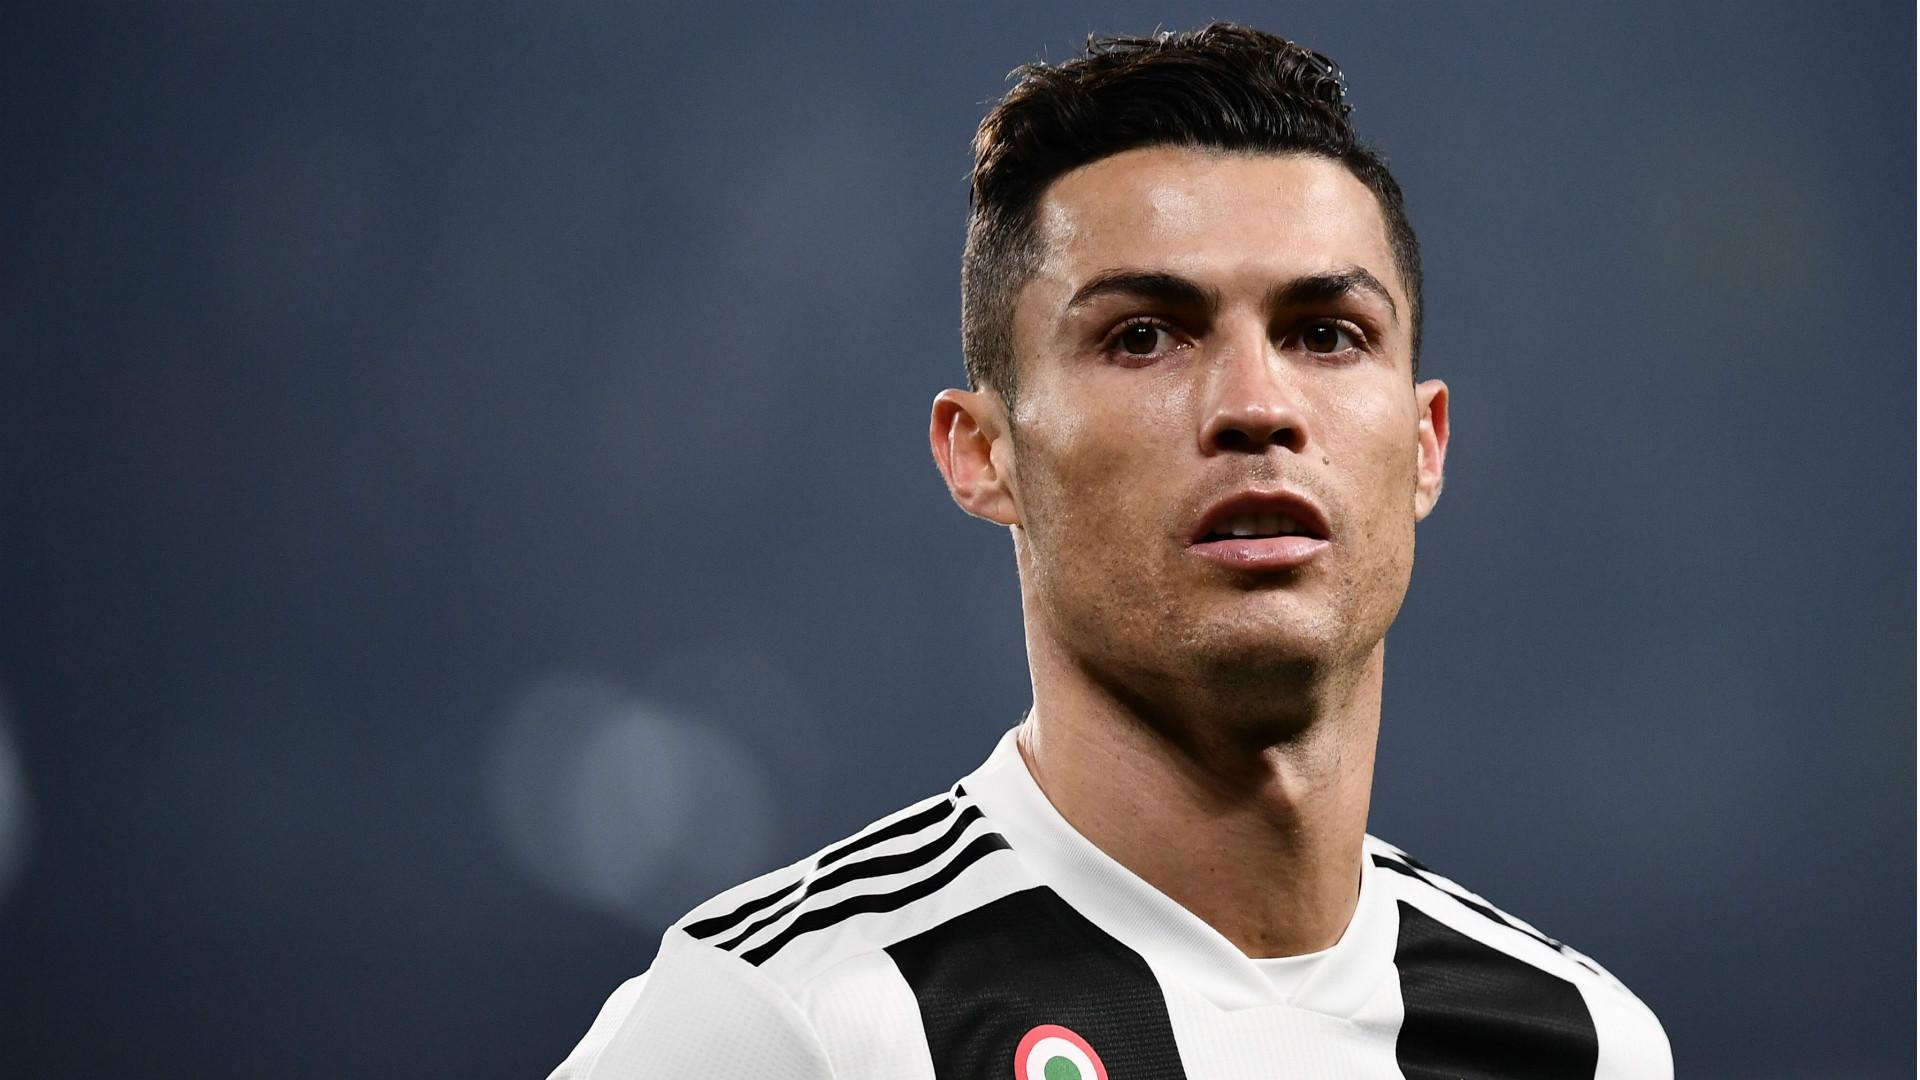 Cristiano Ronaldo Admits He Paid $375,000 to Rape Accuser ...   Cristiano Ronaldo